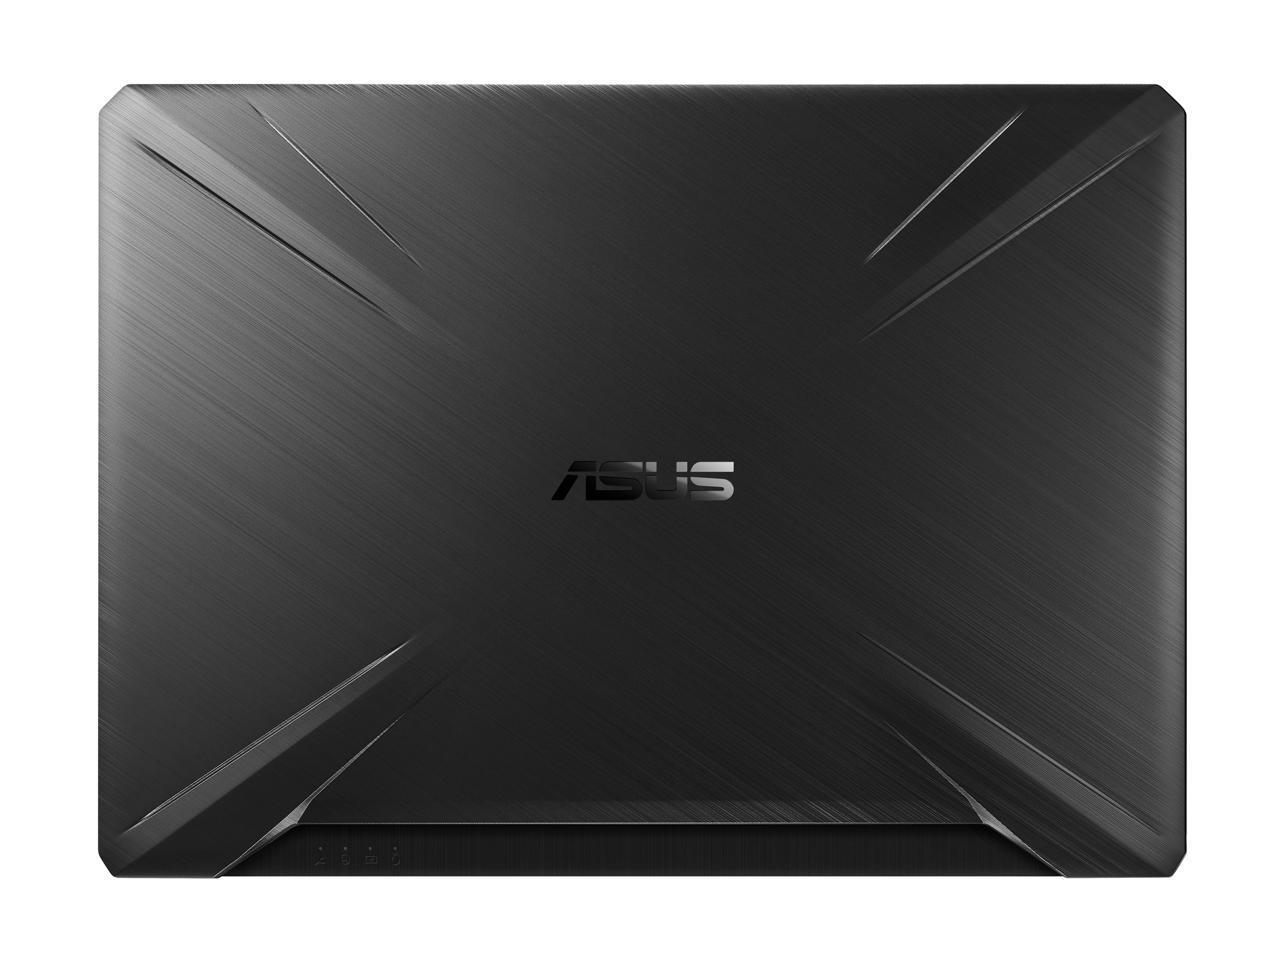 Noutbuk Asus Tuf Gaming FX505GT-DS51 (FX505GT-DS51)  - 4